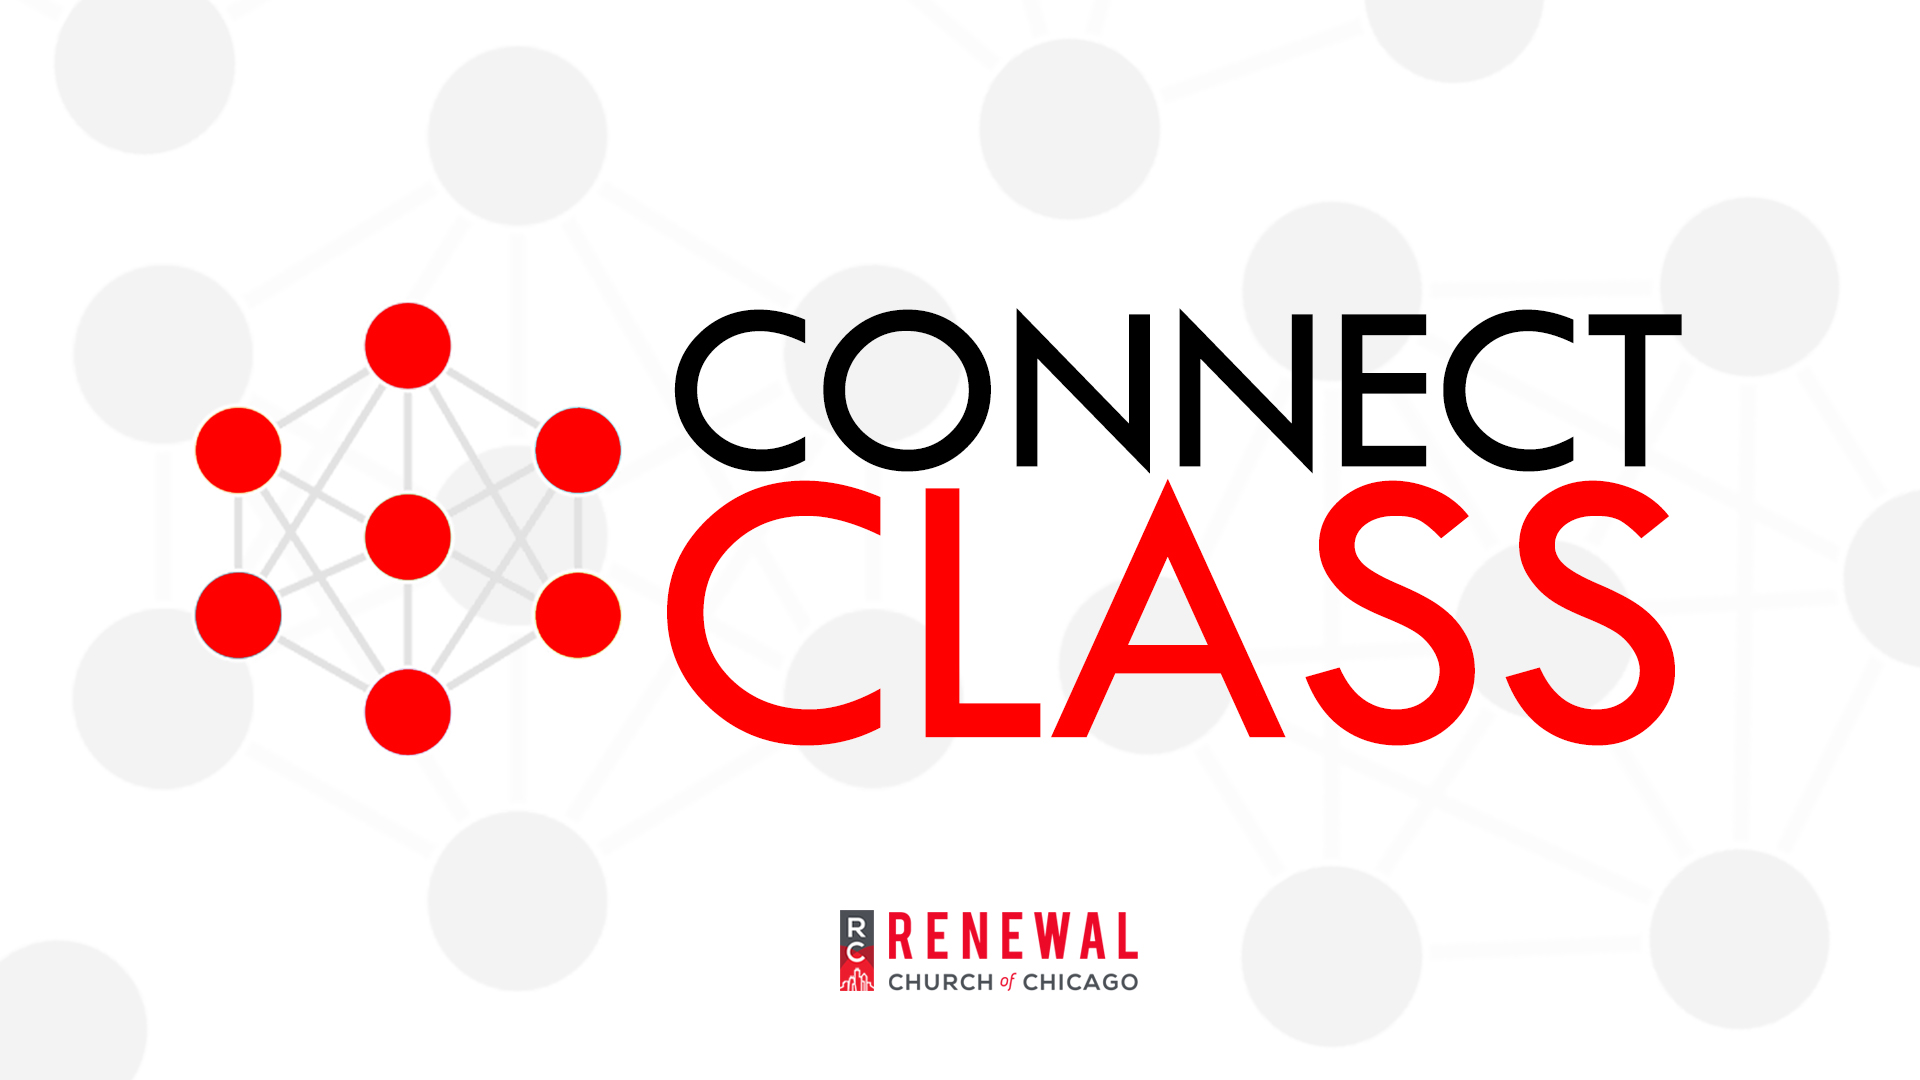 Connect Class rcc 1.jpg